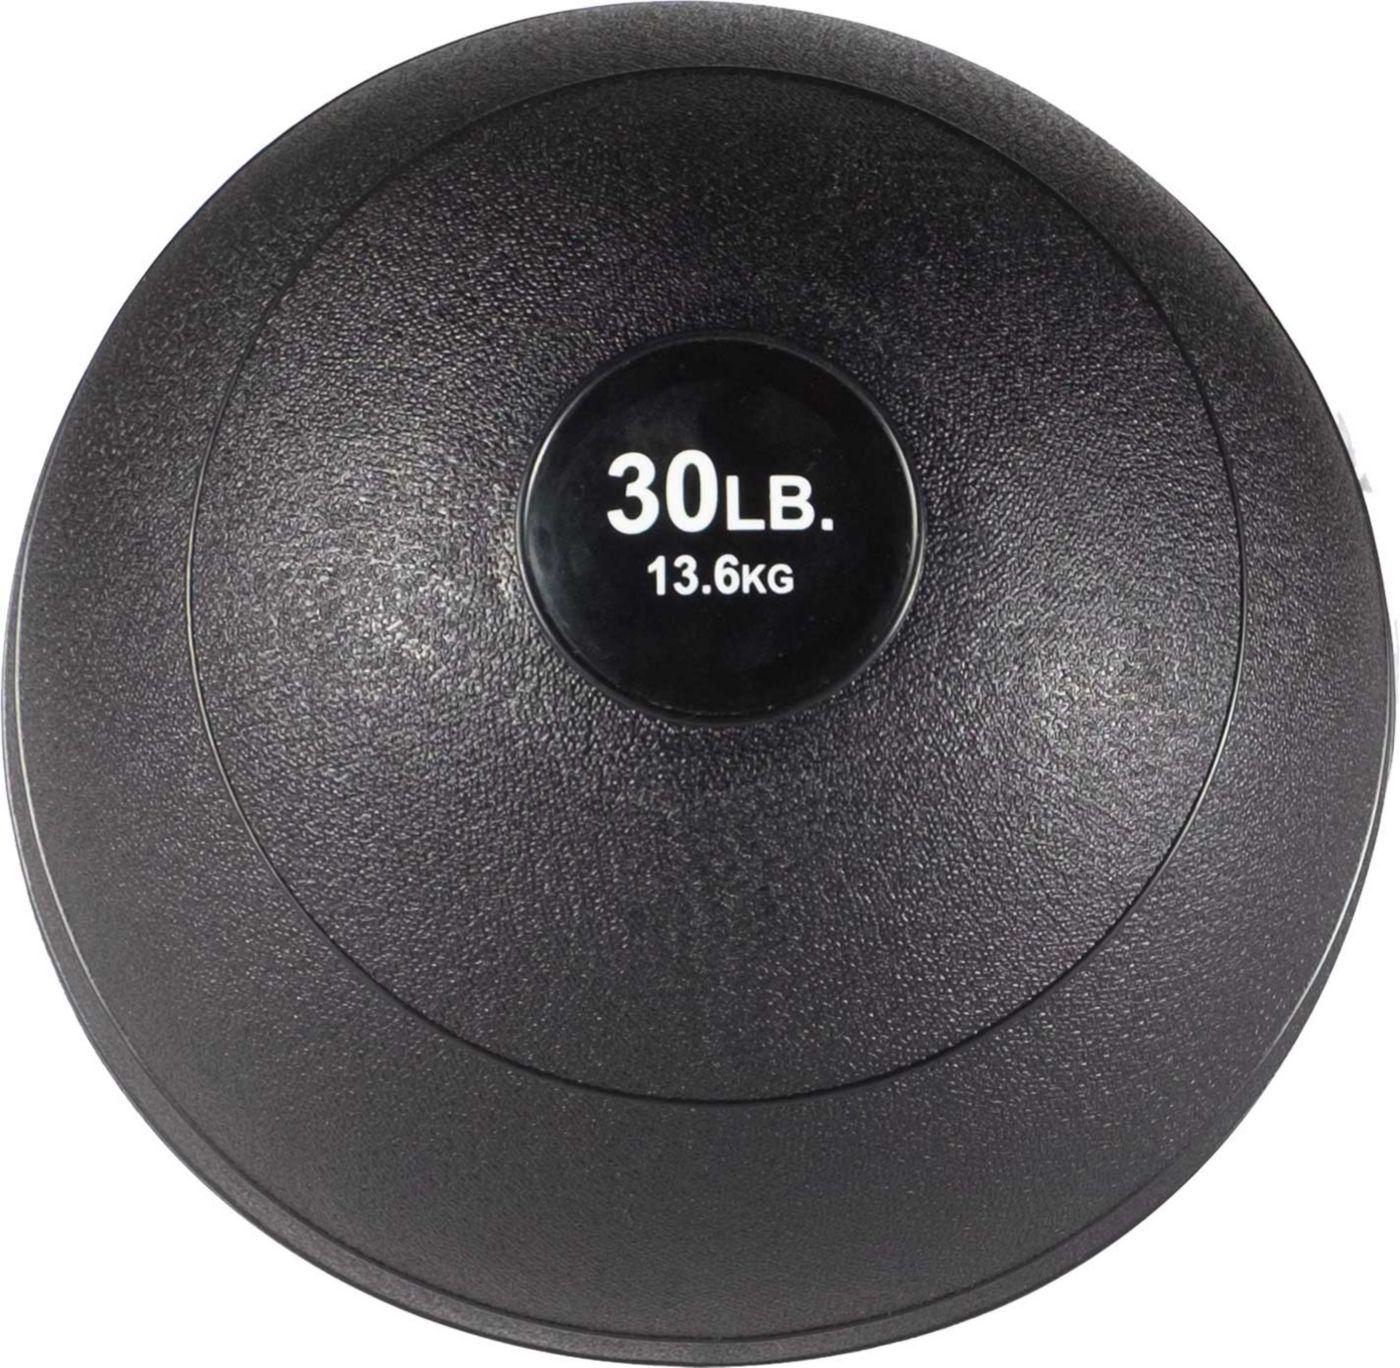 Body Solid 30 lb. Slam Ball